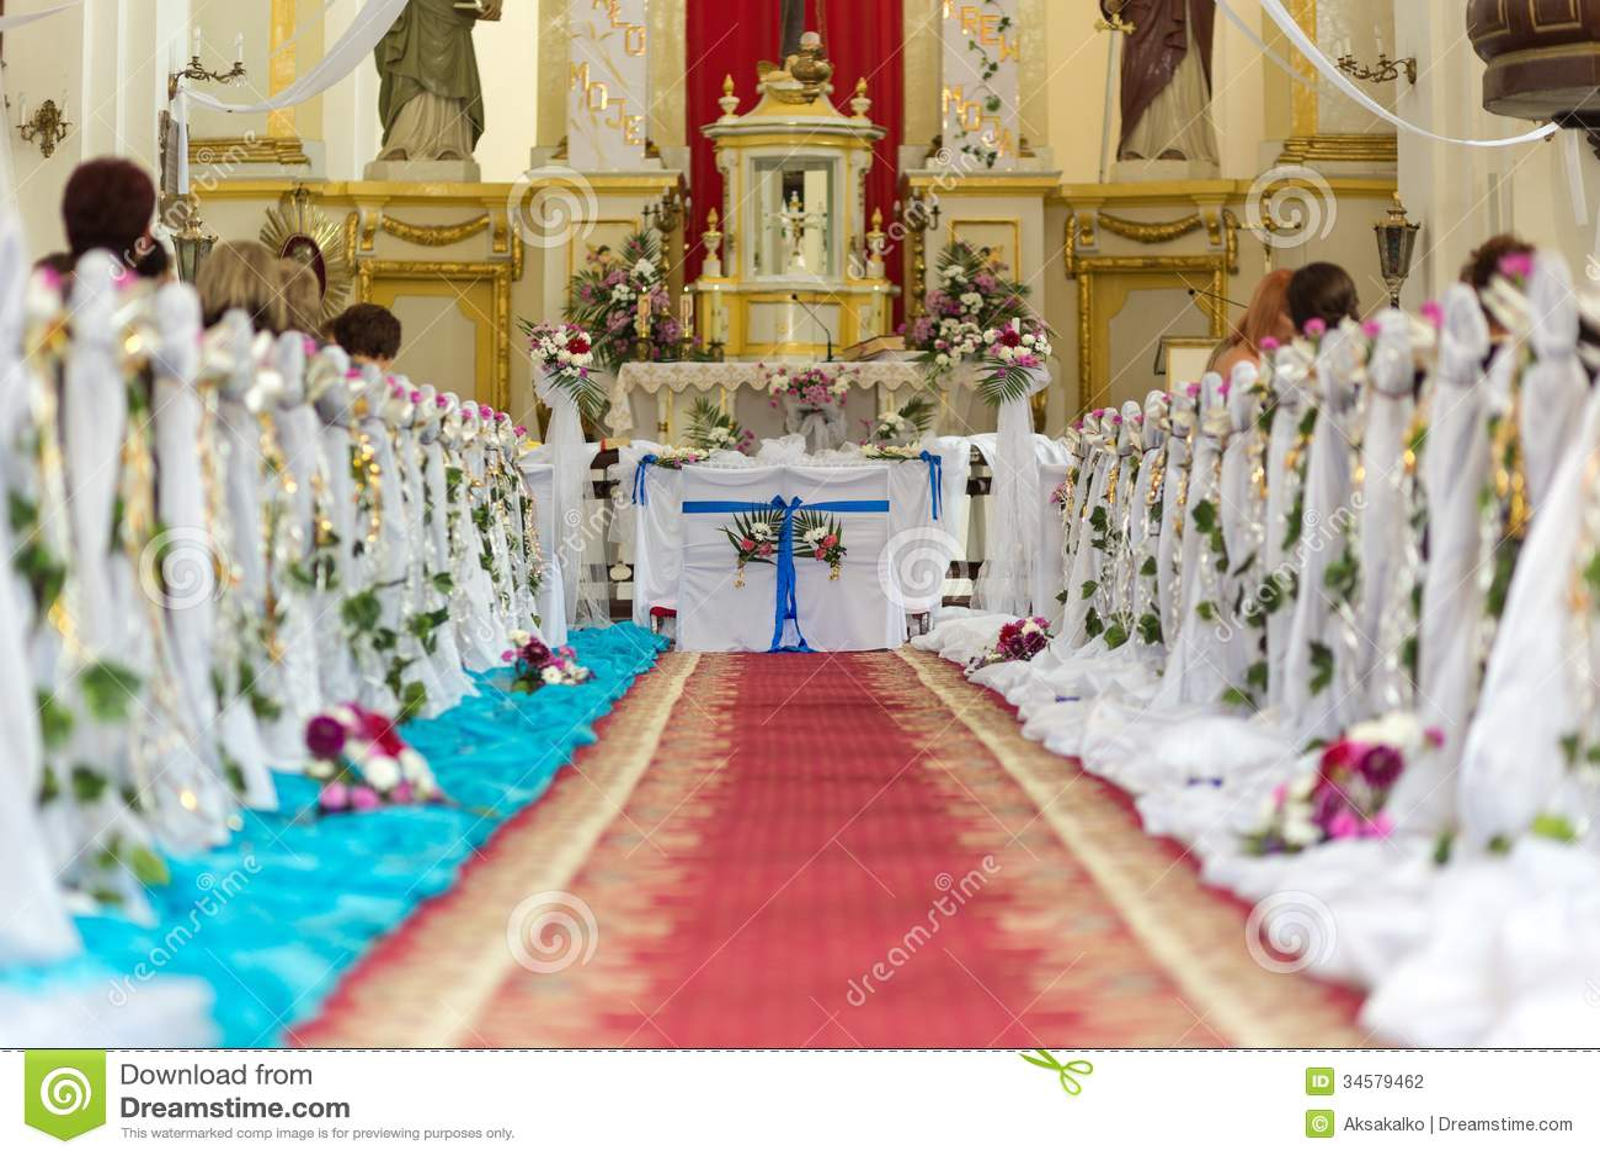 La iglesia está lista para la ceremonia de boda